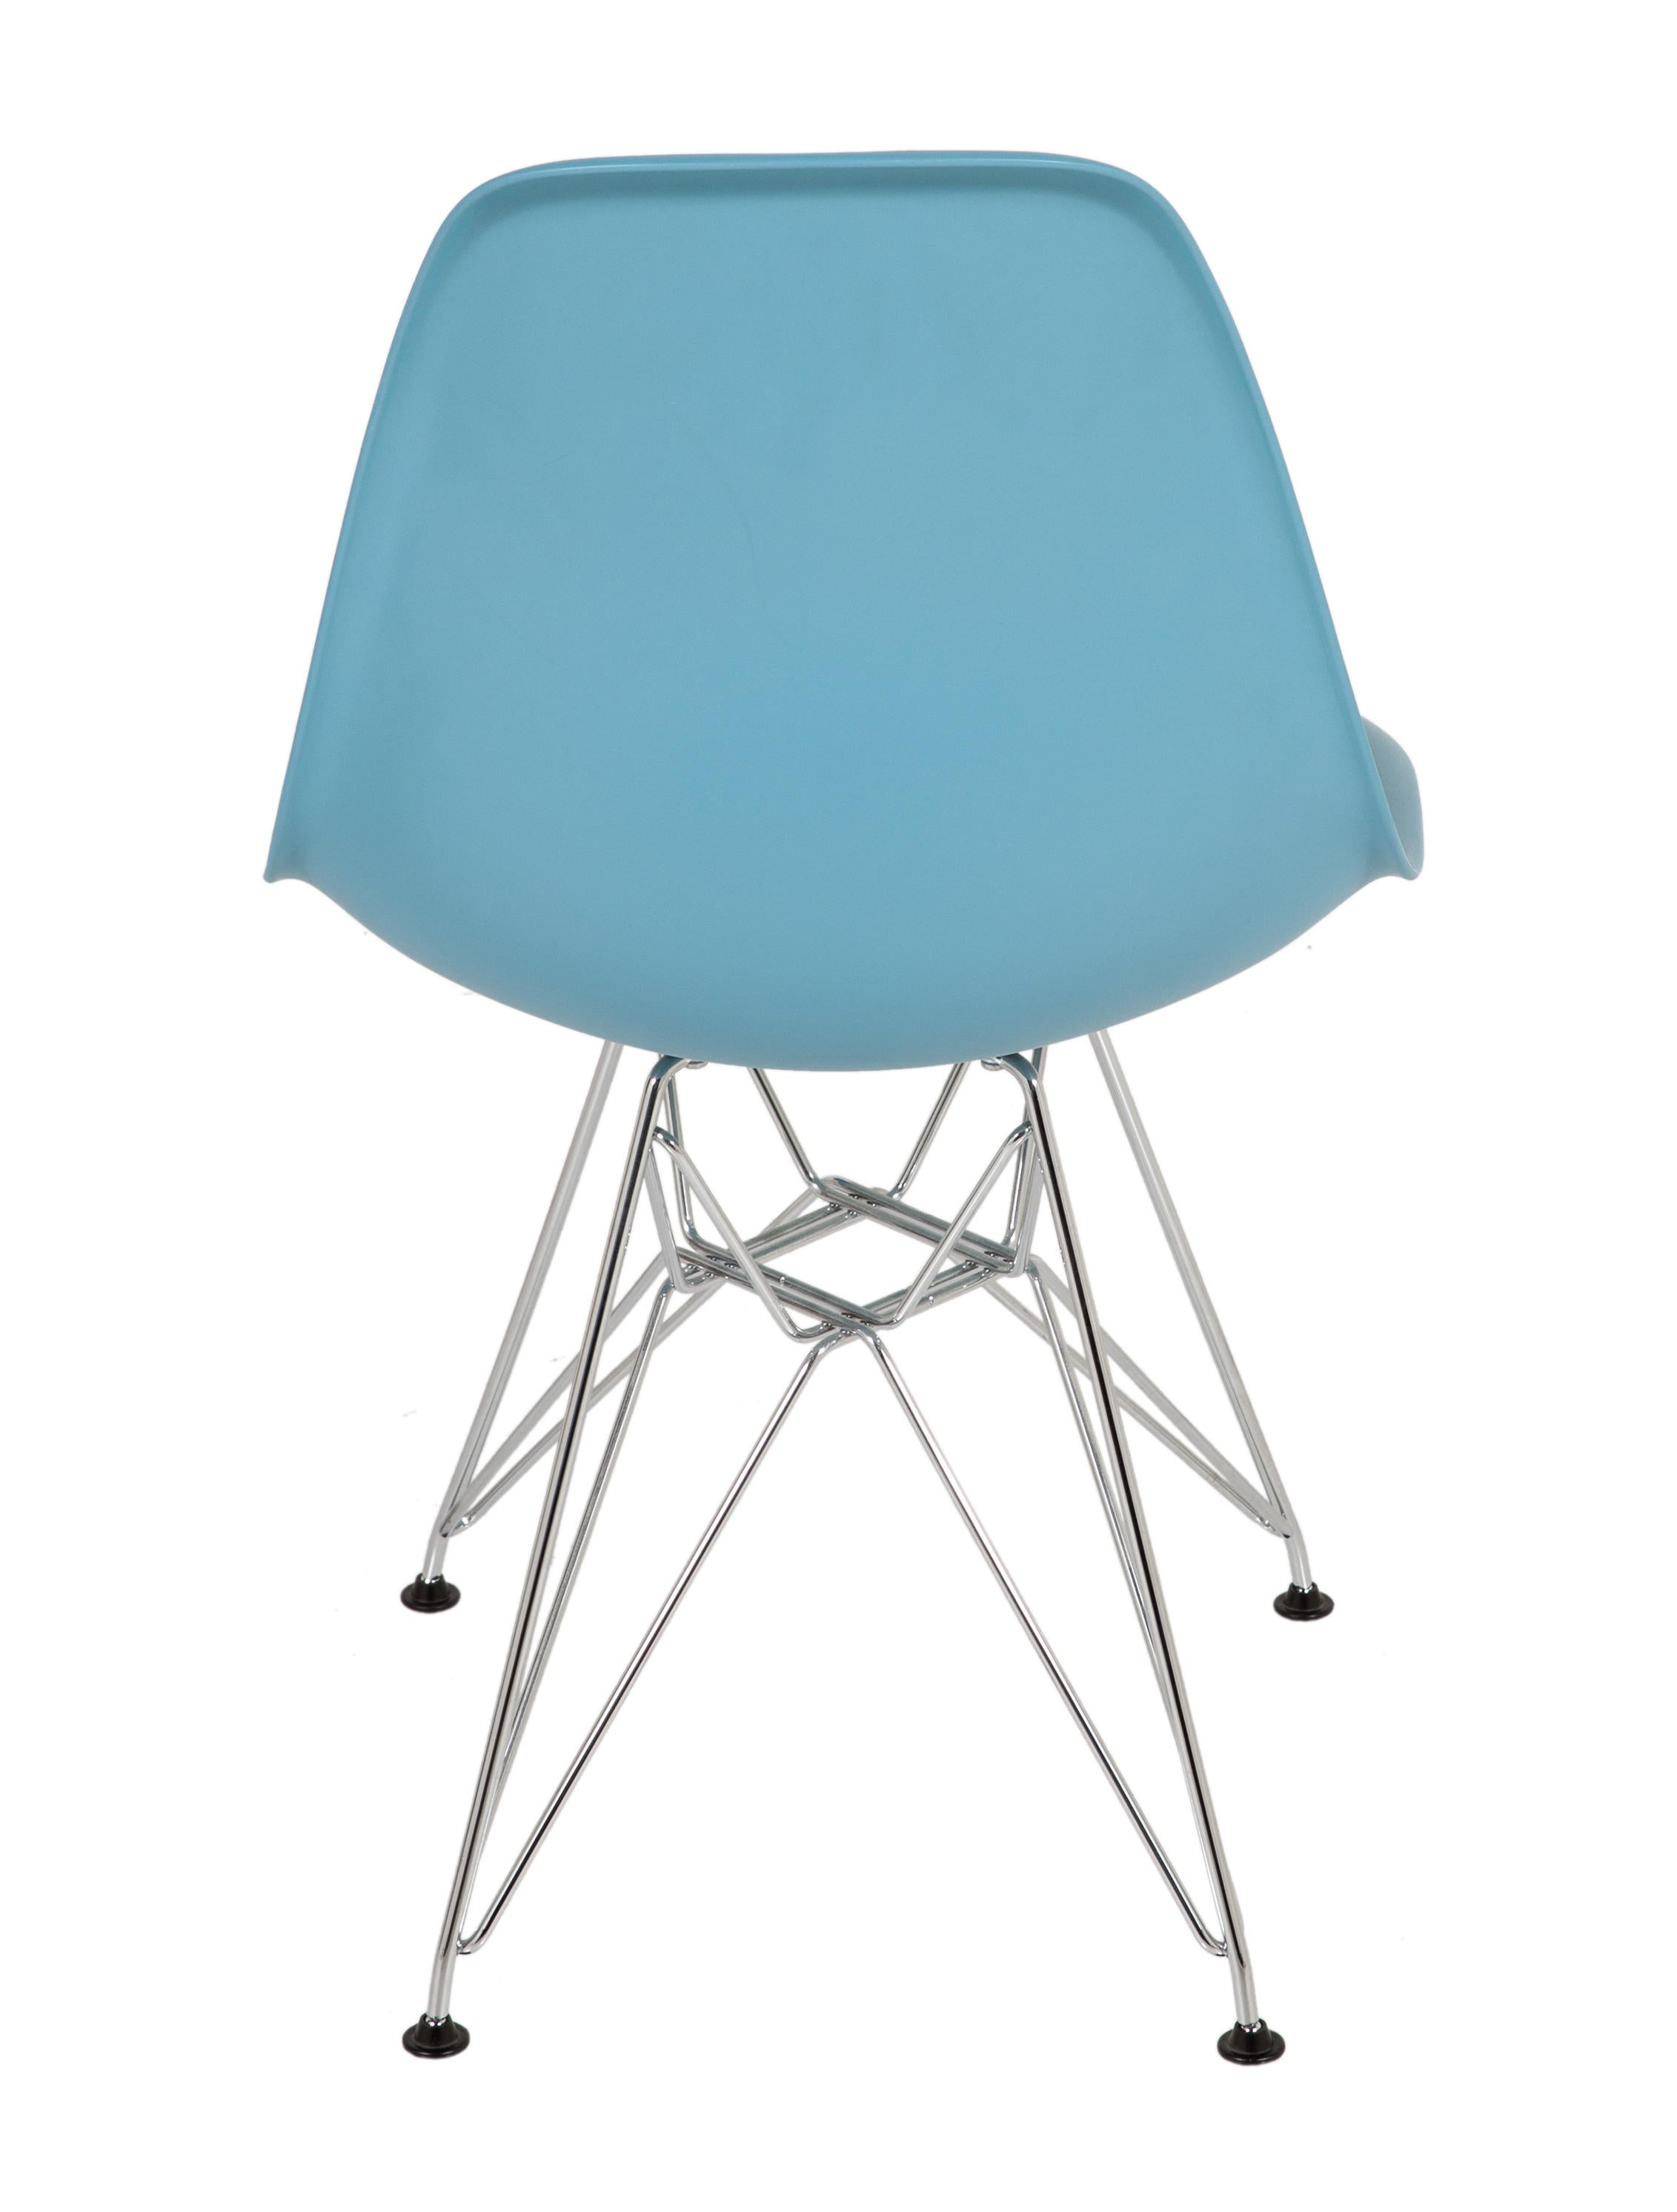 vitra eames molded fiberglass side chair furniture. Black Bedroom Furniture Sets. Home Design Ideas